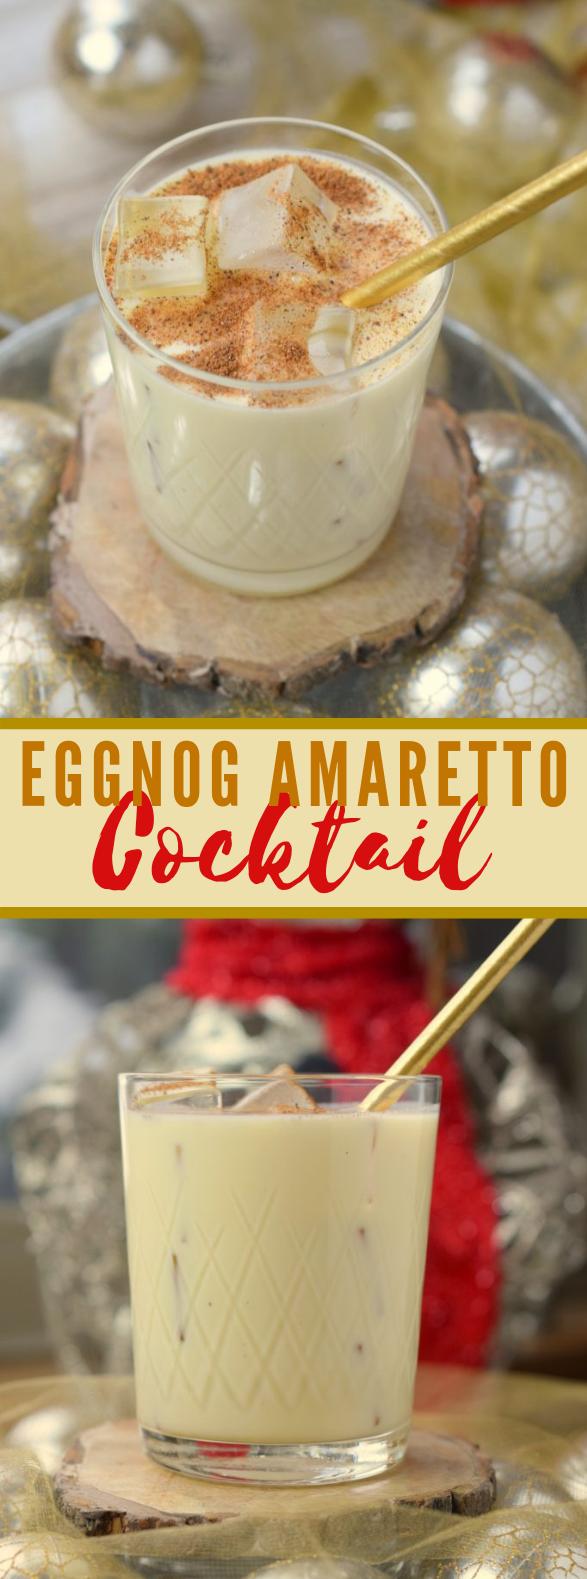 Eggnog Amaretto Cocktail #drinks #christmas